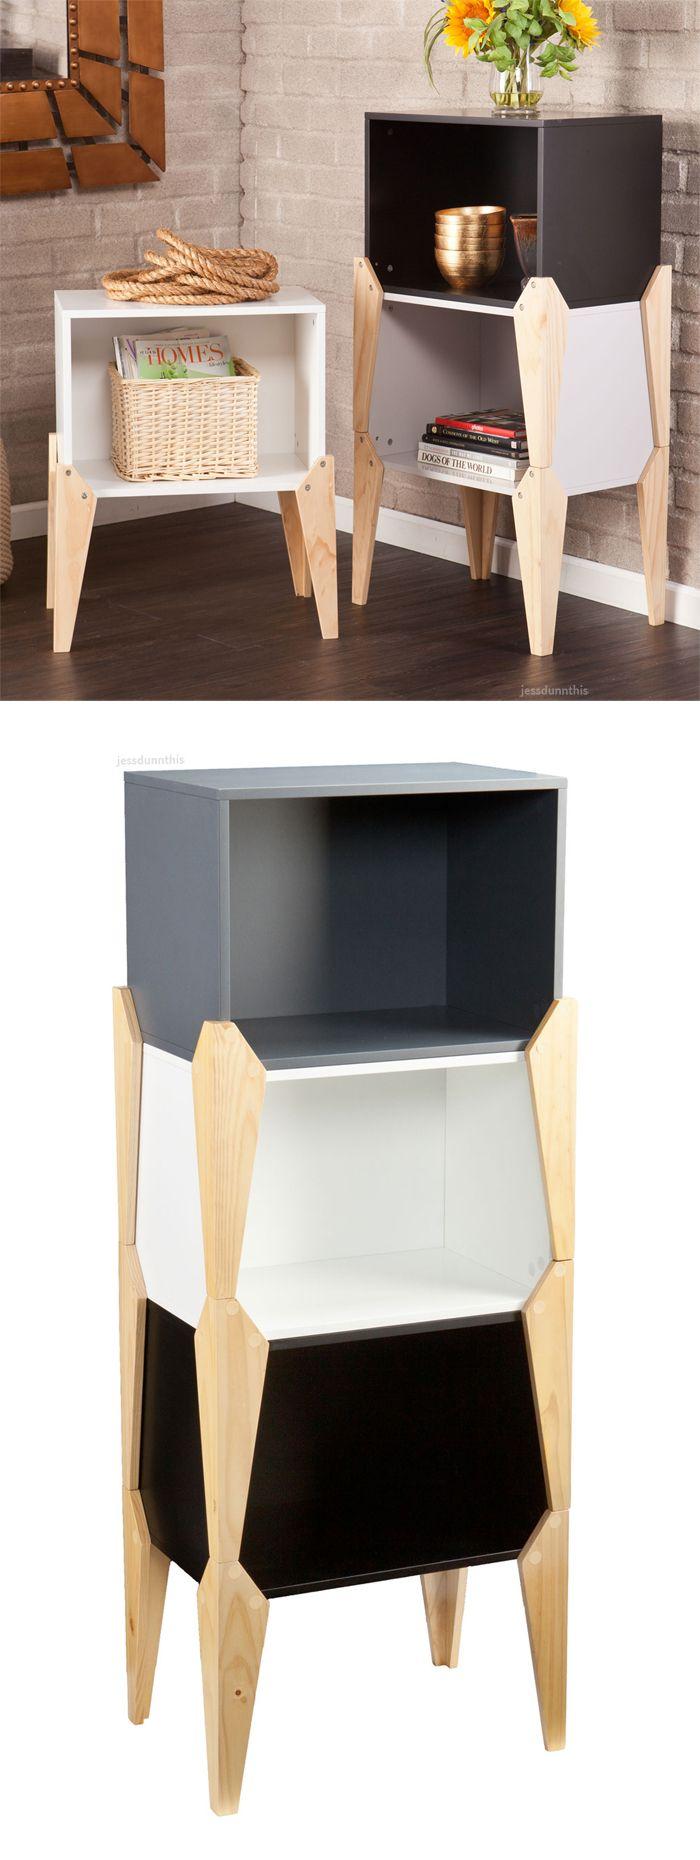 Idea Furniture davis side table mid century. modern twist.~table options for